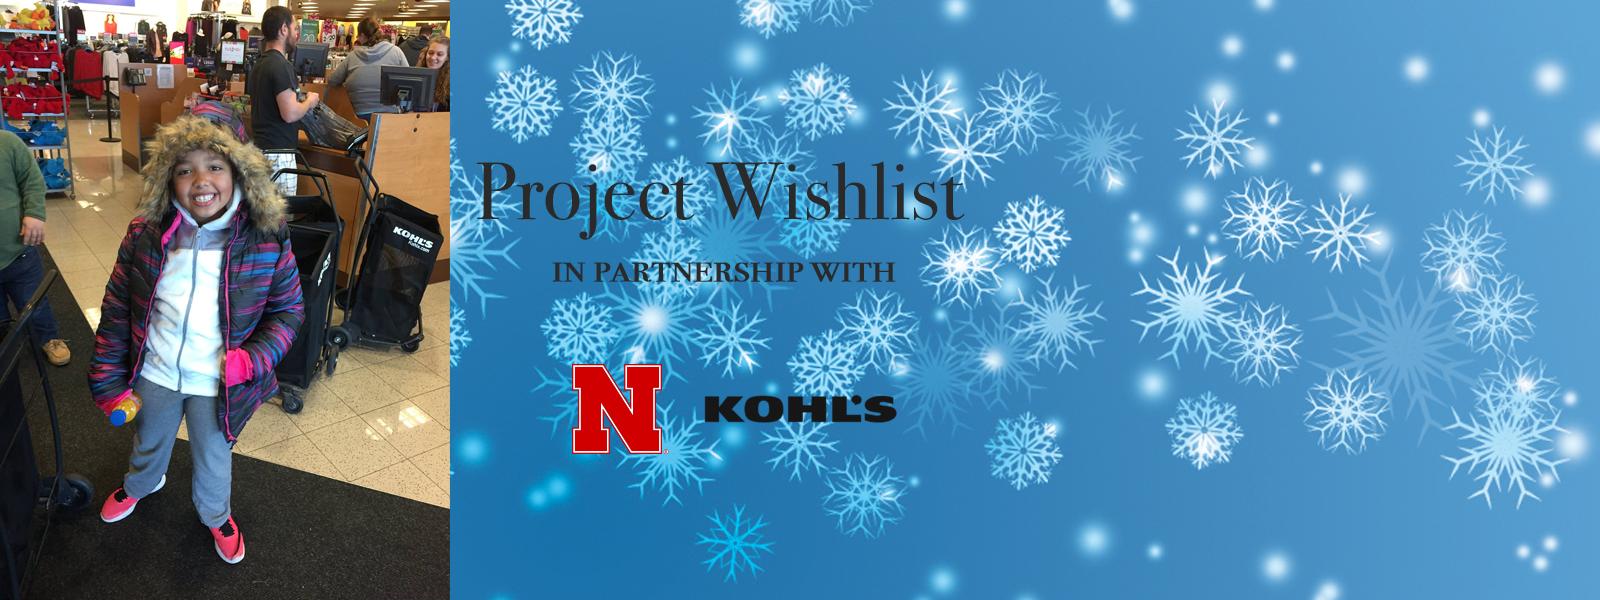 Project Wishlist image